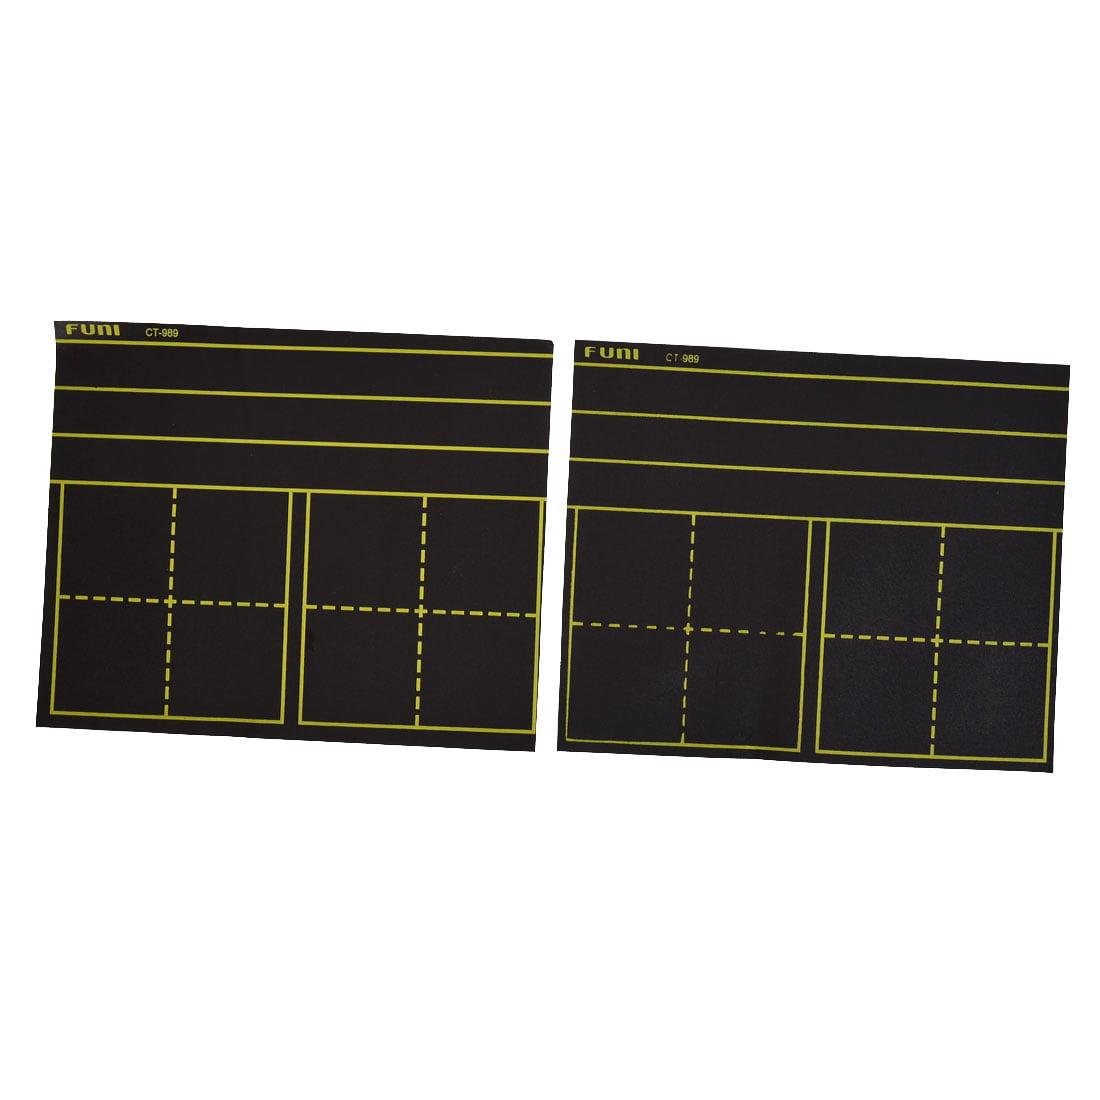 "Unique Bargains 2 Pcs 11"" x 9"" School Parallel Matts Print Adhesive Blackboard Magnets"